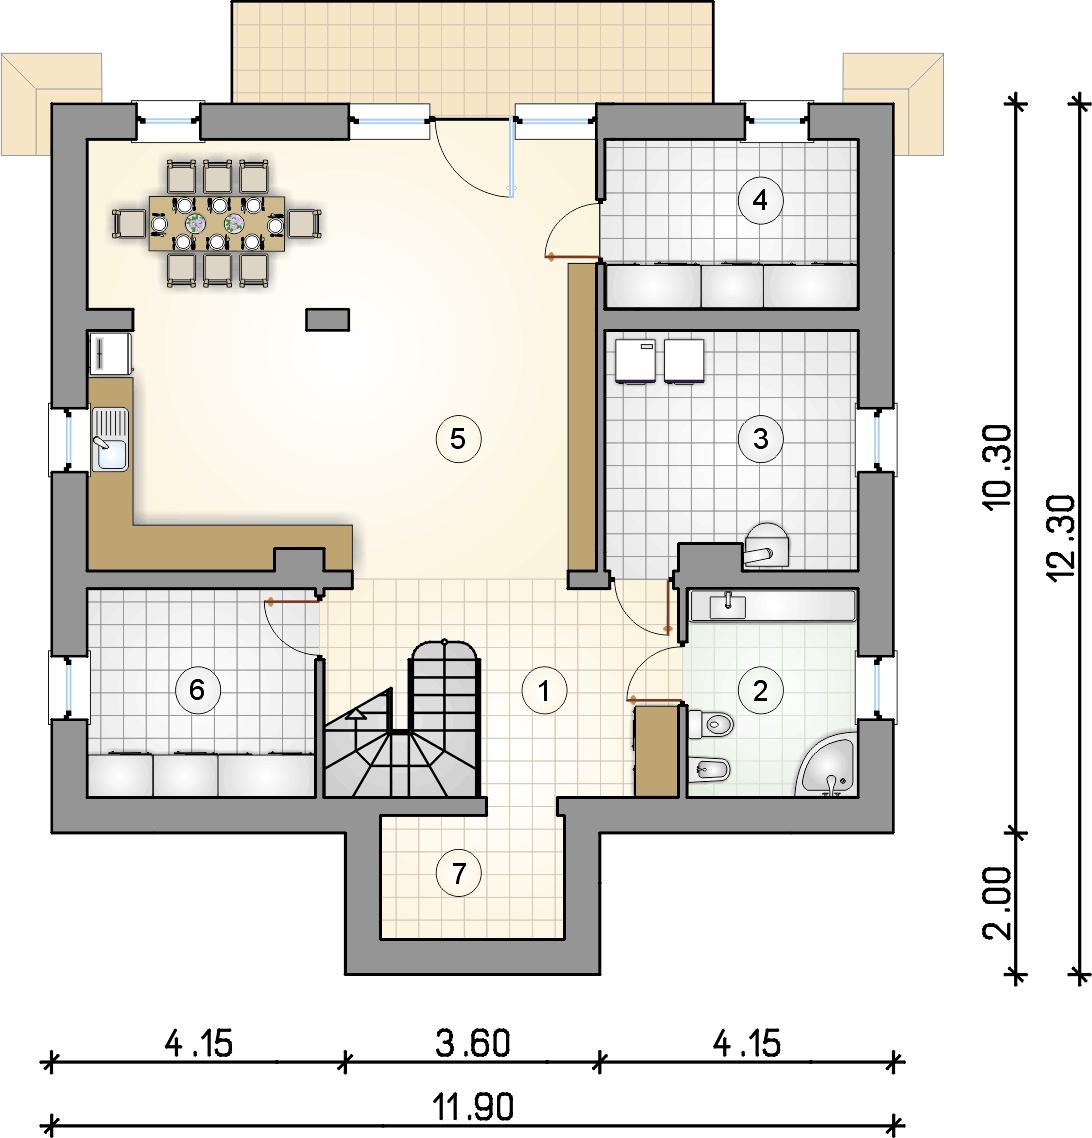 rzut piwnic - projekt Marzanka II - wersja lustrzana